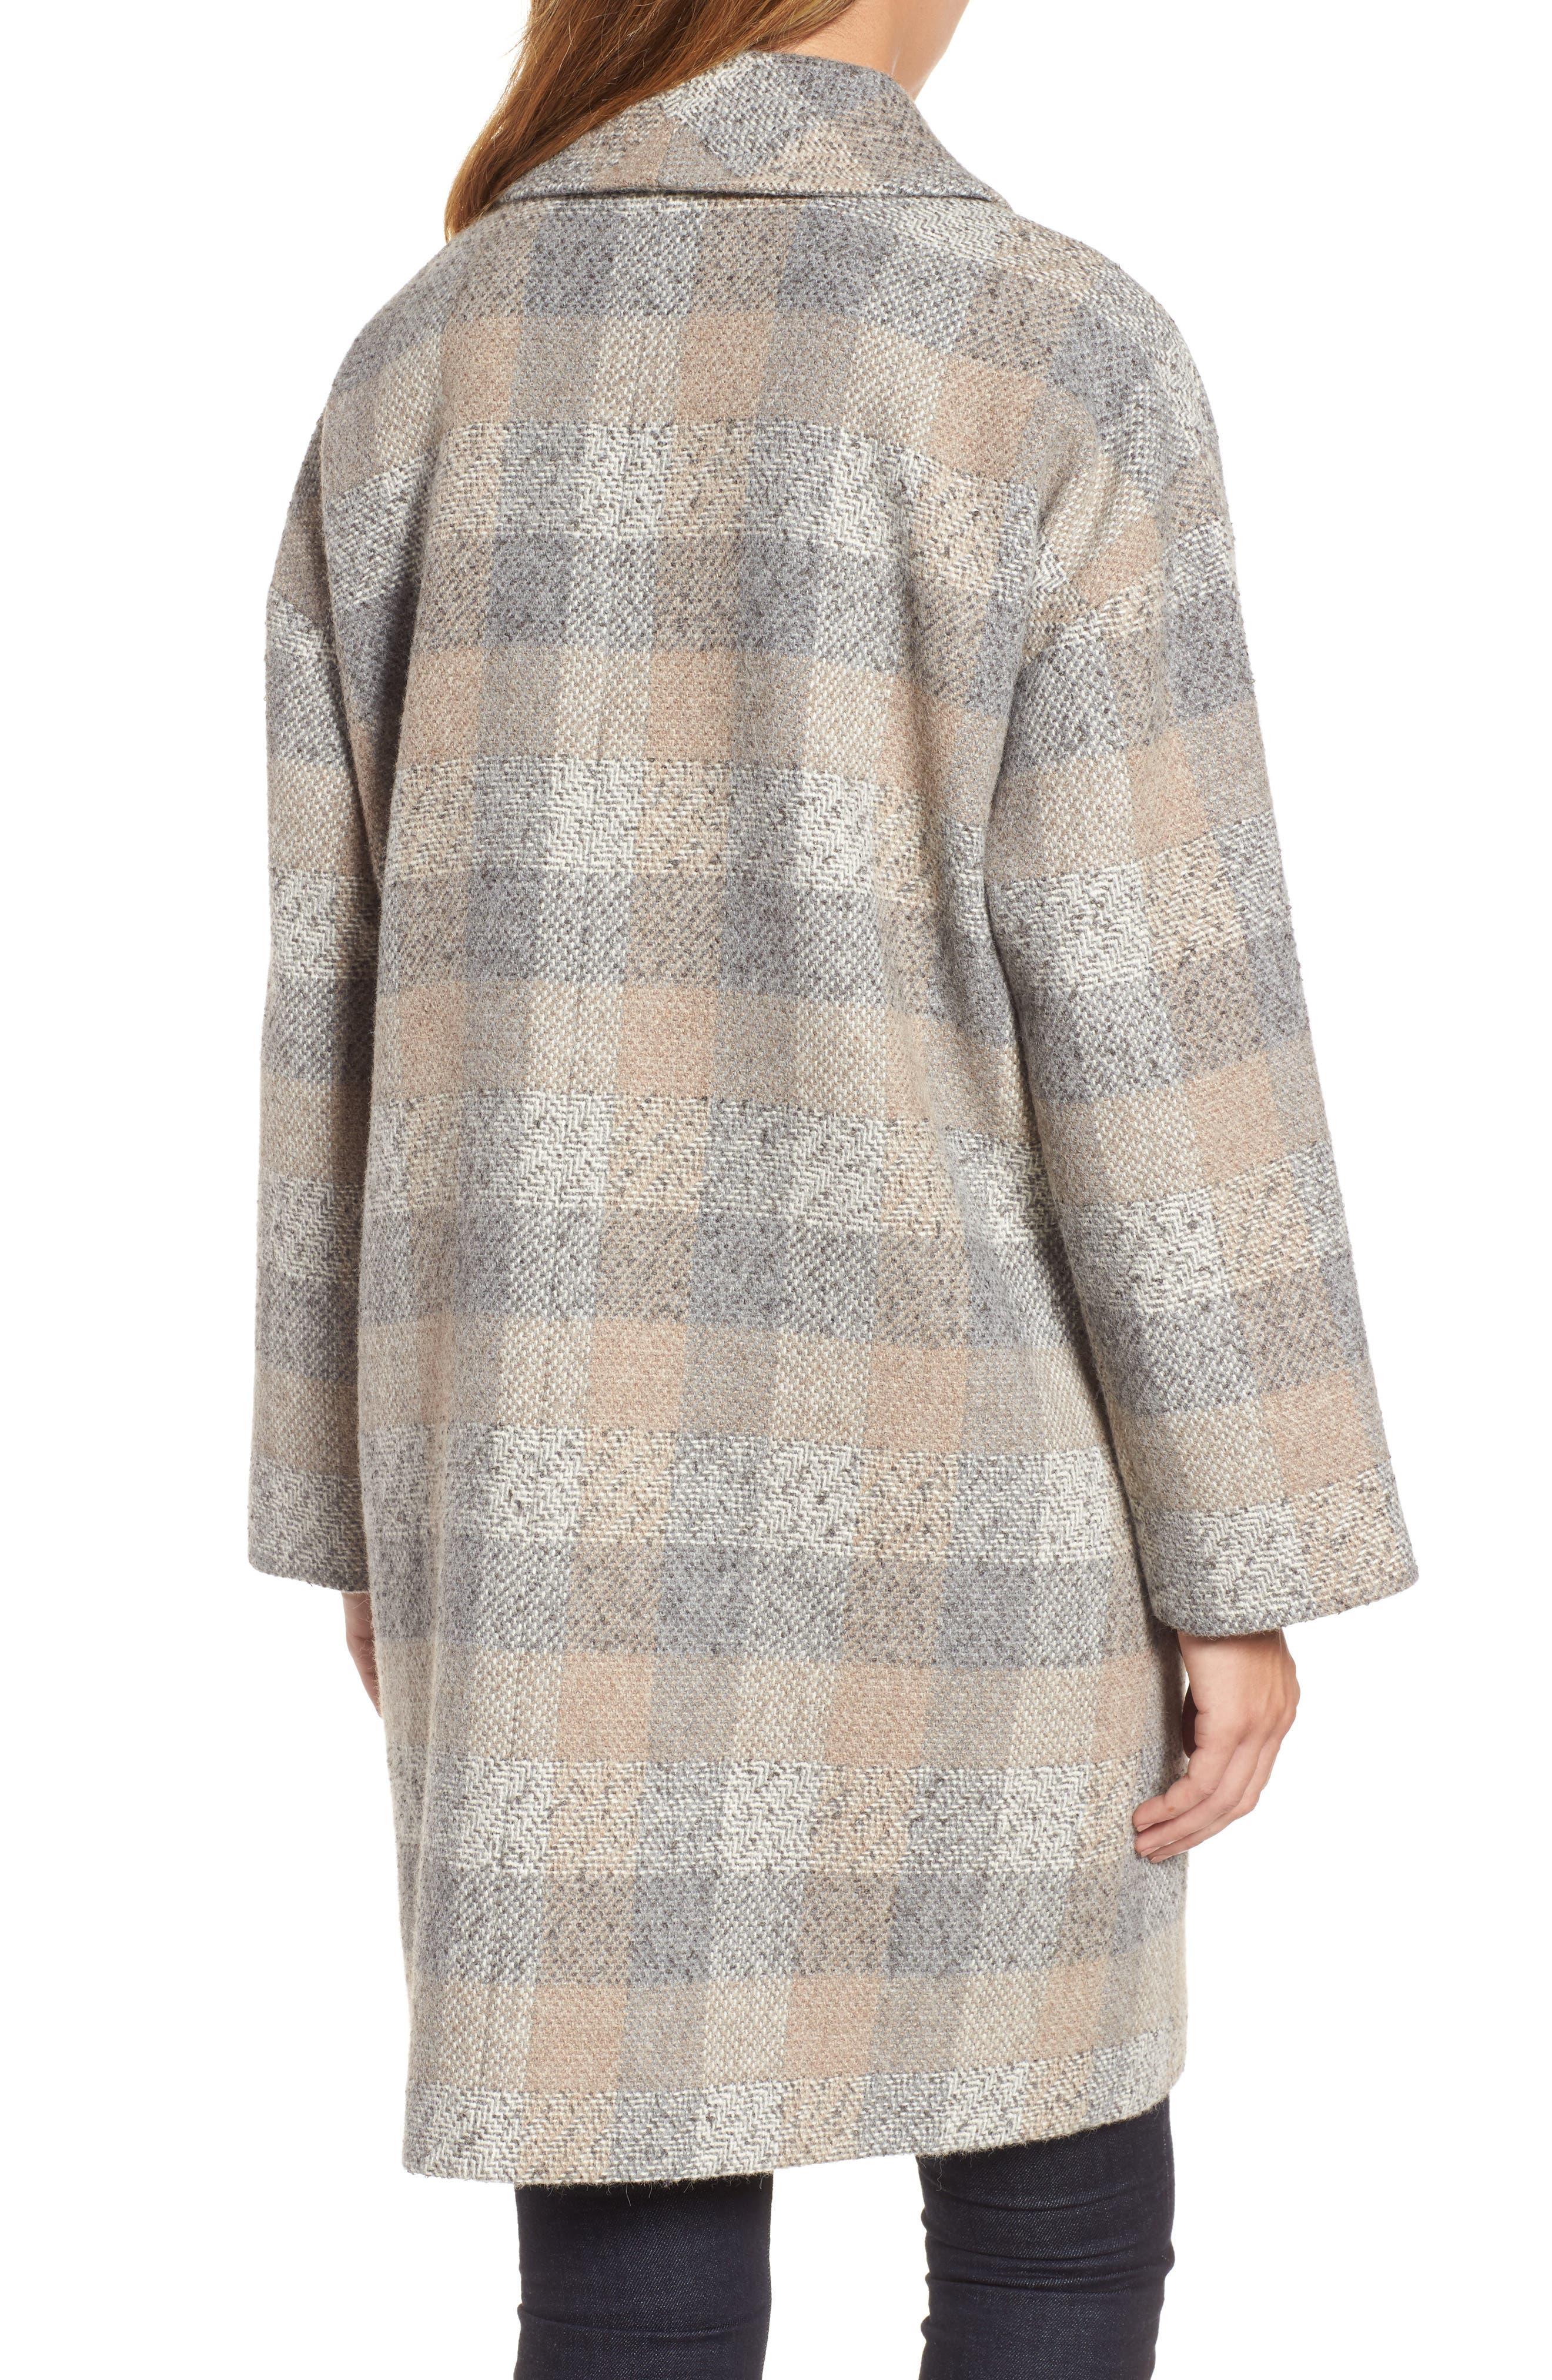 Plaid Alpaca Blend Coat,                             Alternate thumbnail 2, color,                             Dark Pearl